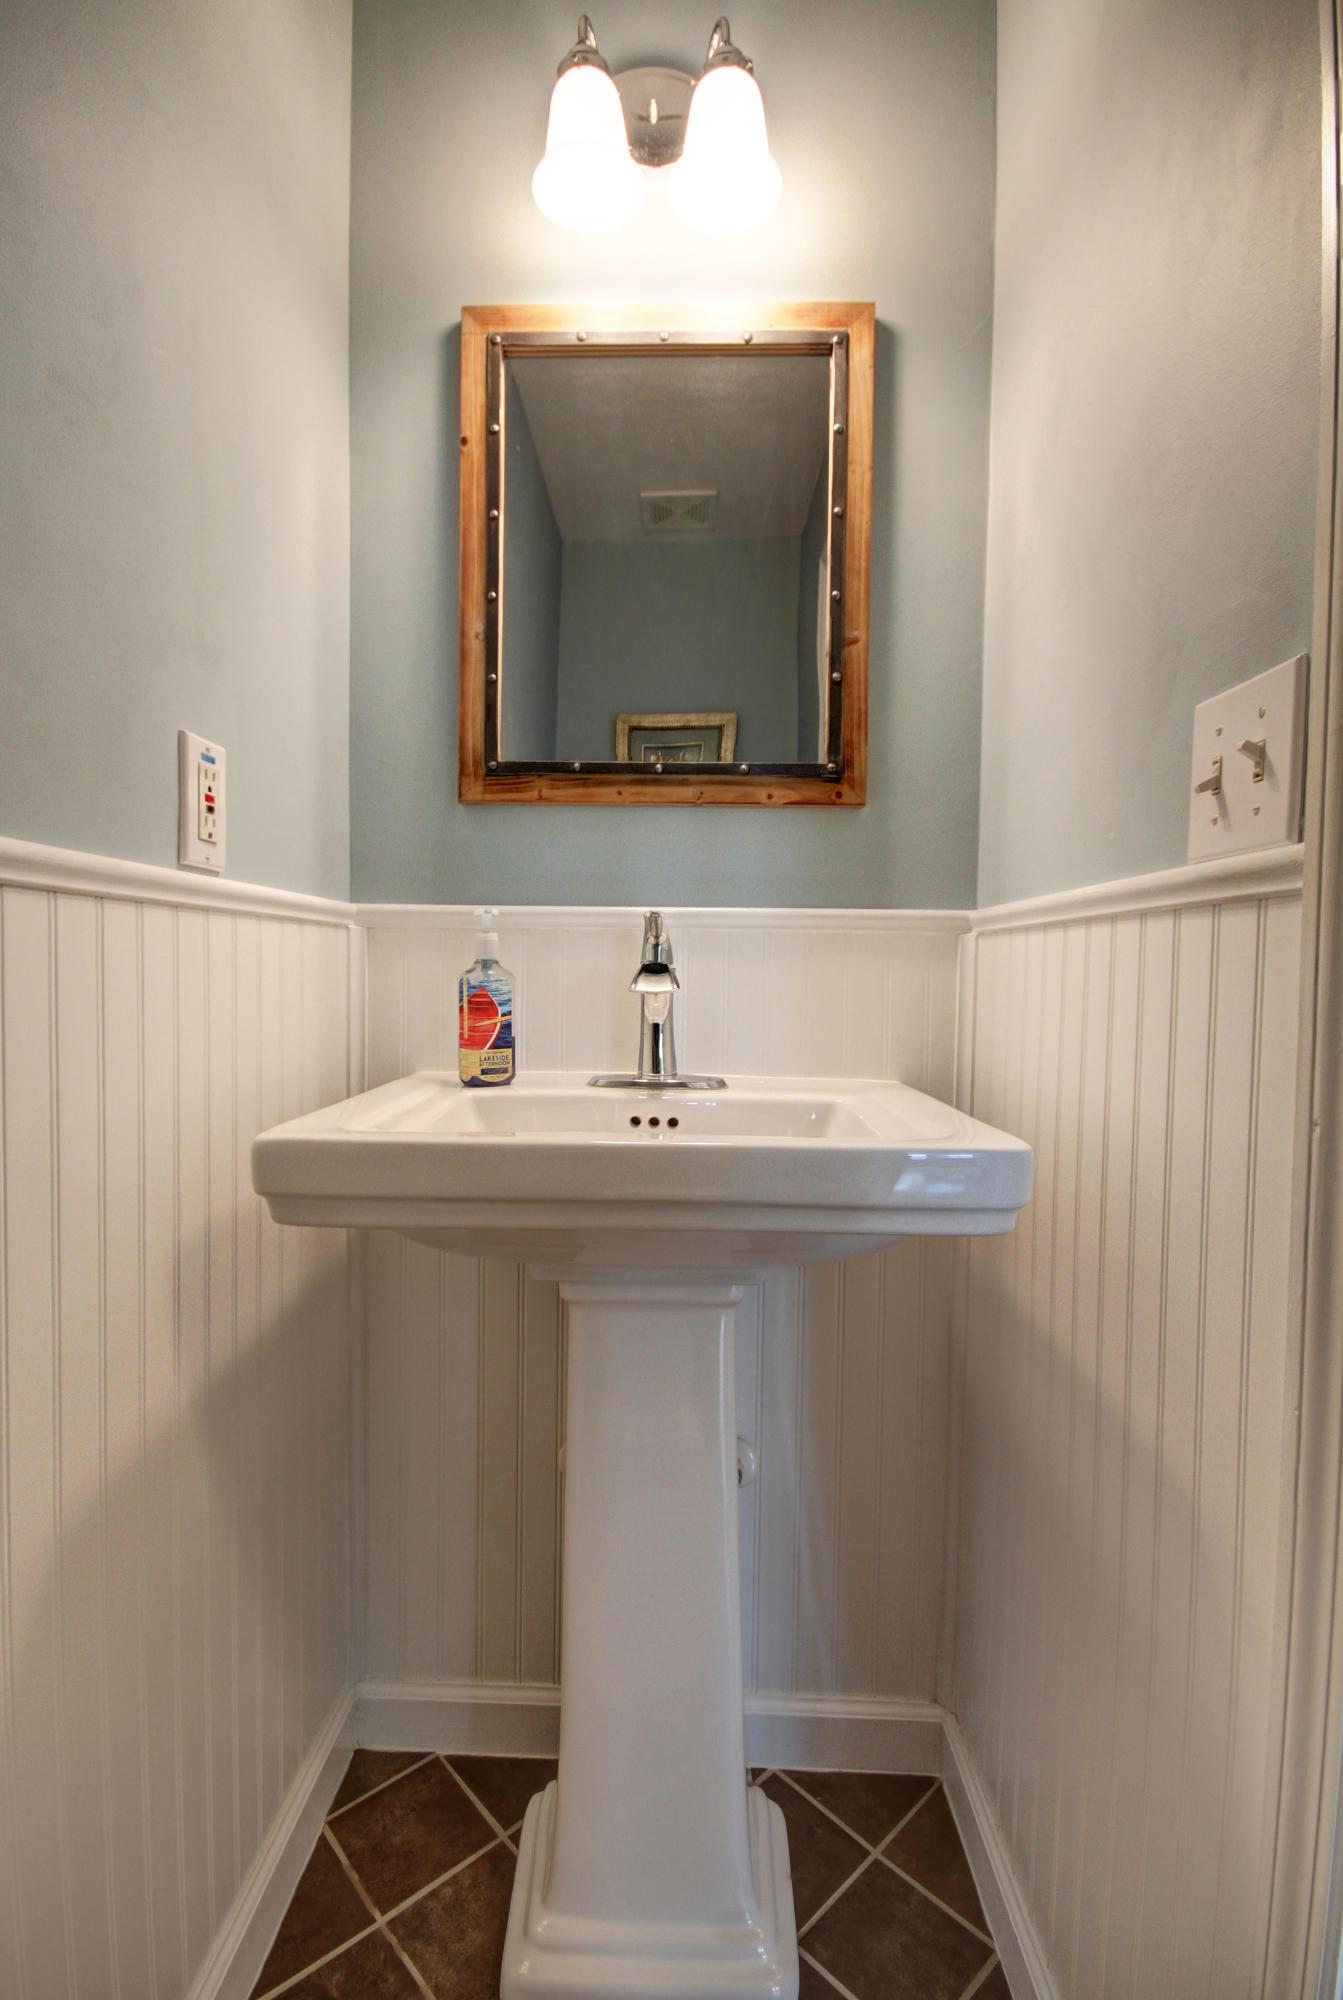 Ivy Hall Homes For Sale - 3257 Morningdale, Mount Pleasant, SC - 13